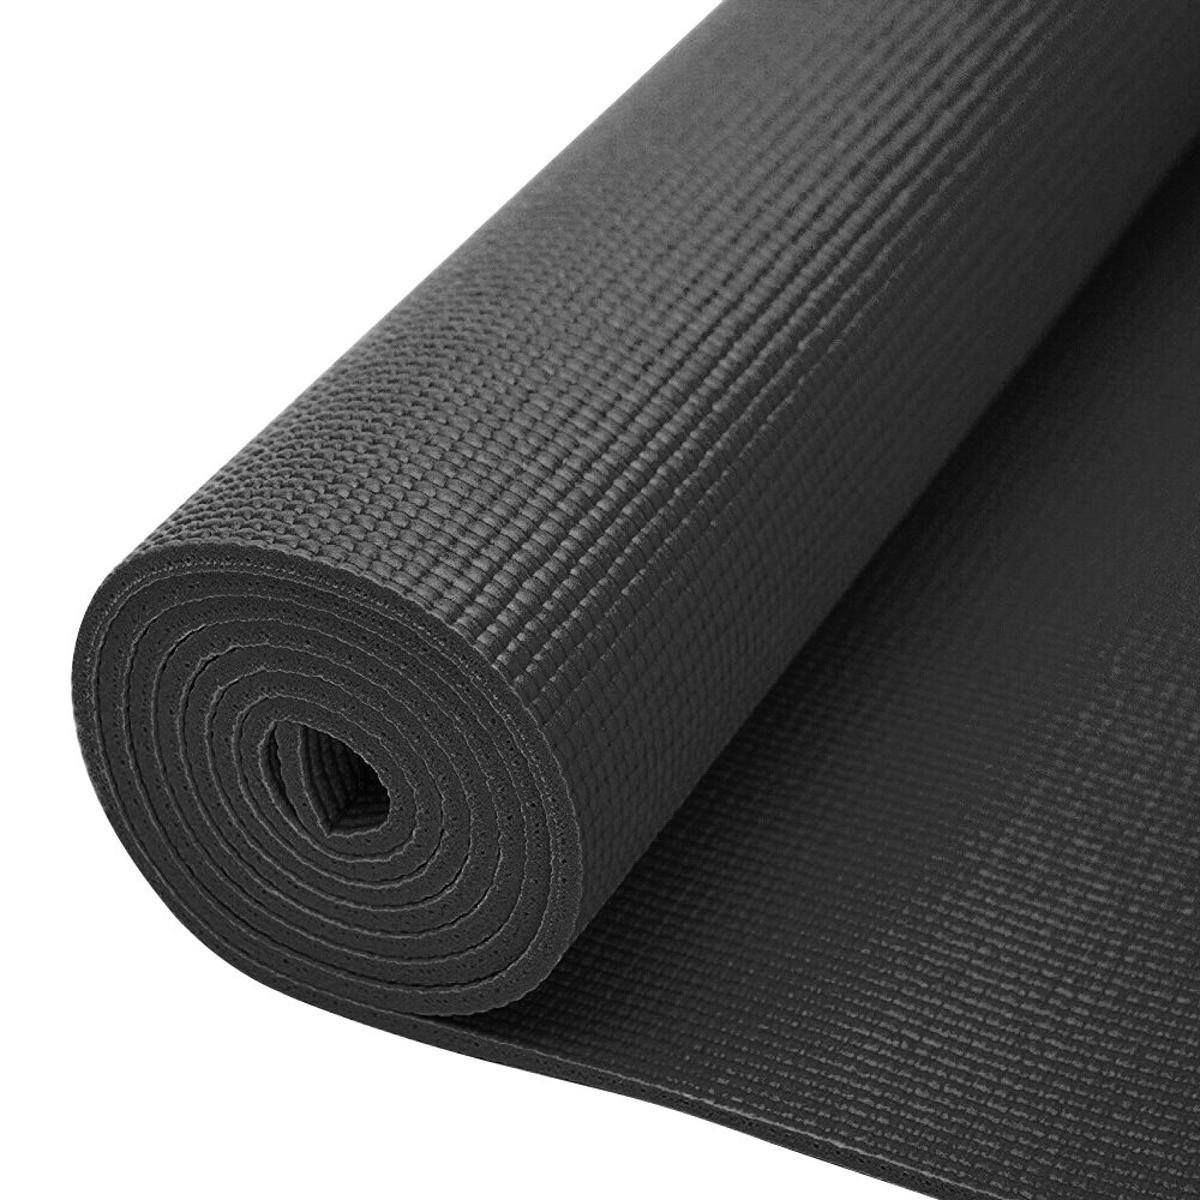 Tapete de Yoga - 1,66m